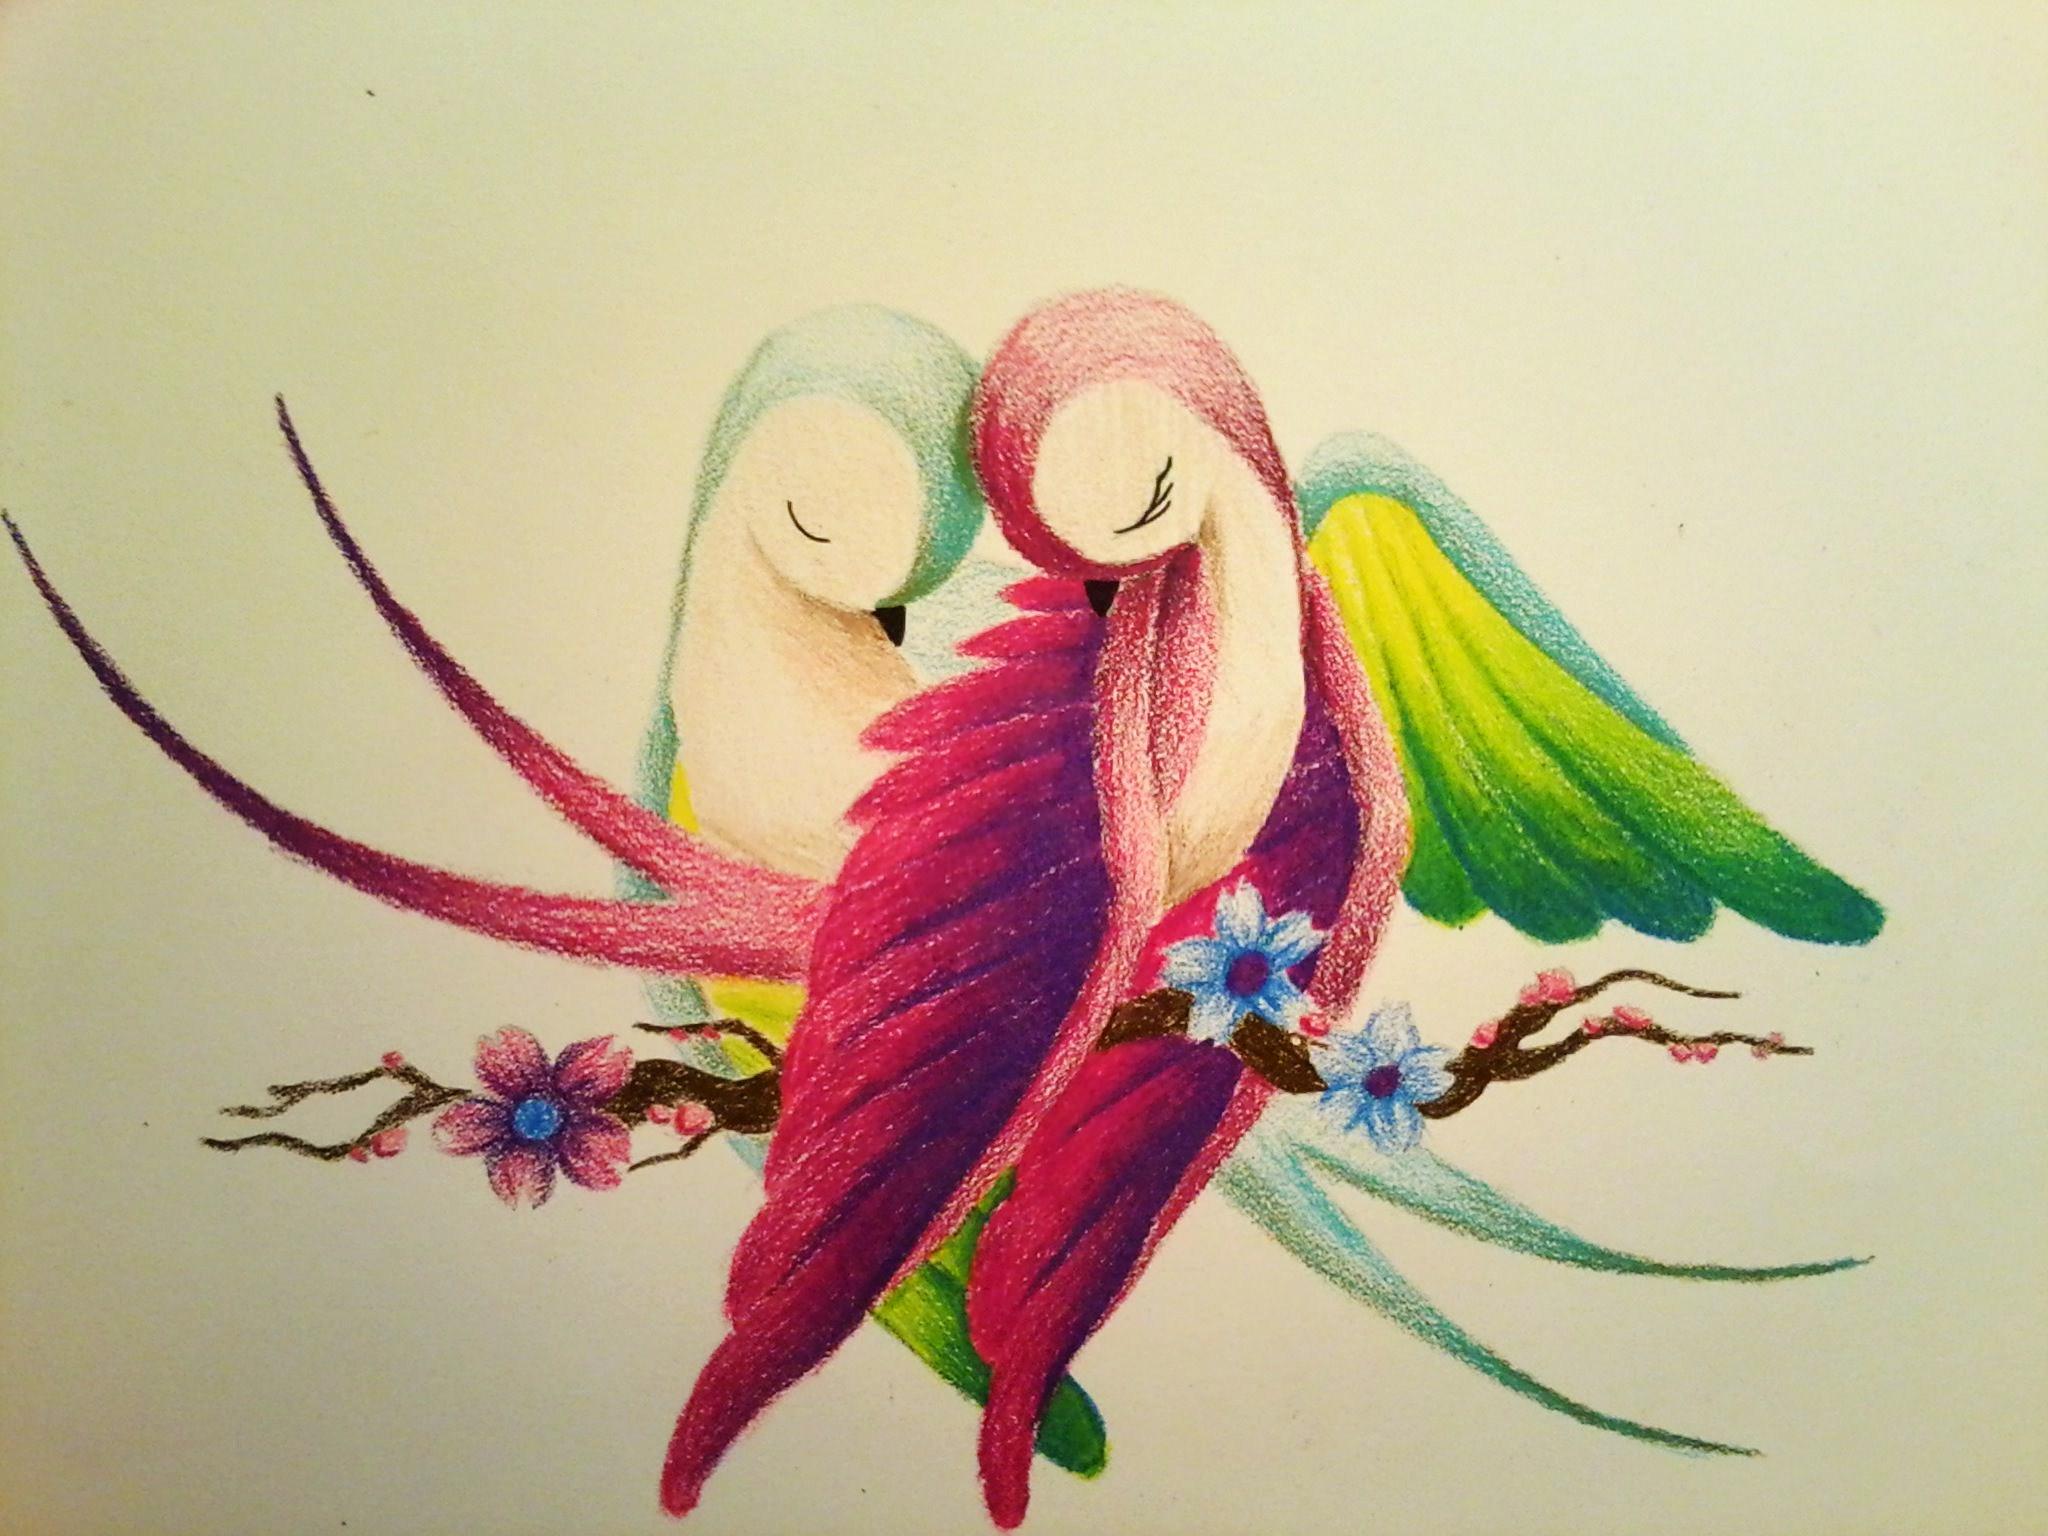 2048x1536 Simple Colour Pencil Sketch Of Birds Love Birds Drawing Simple